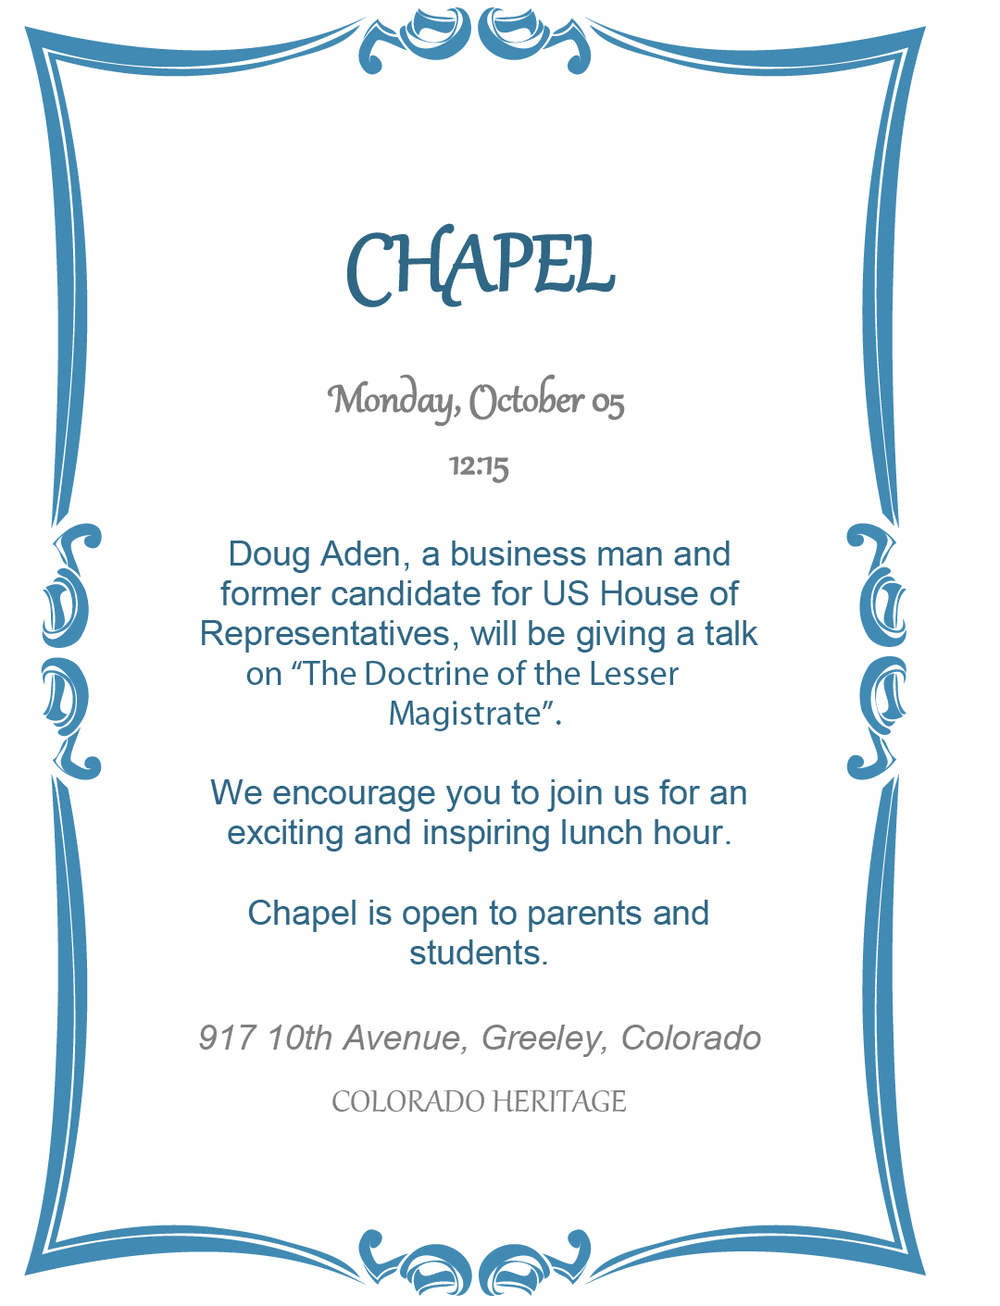 Chapel Invitation Fall 2015.jpg